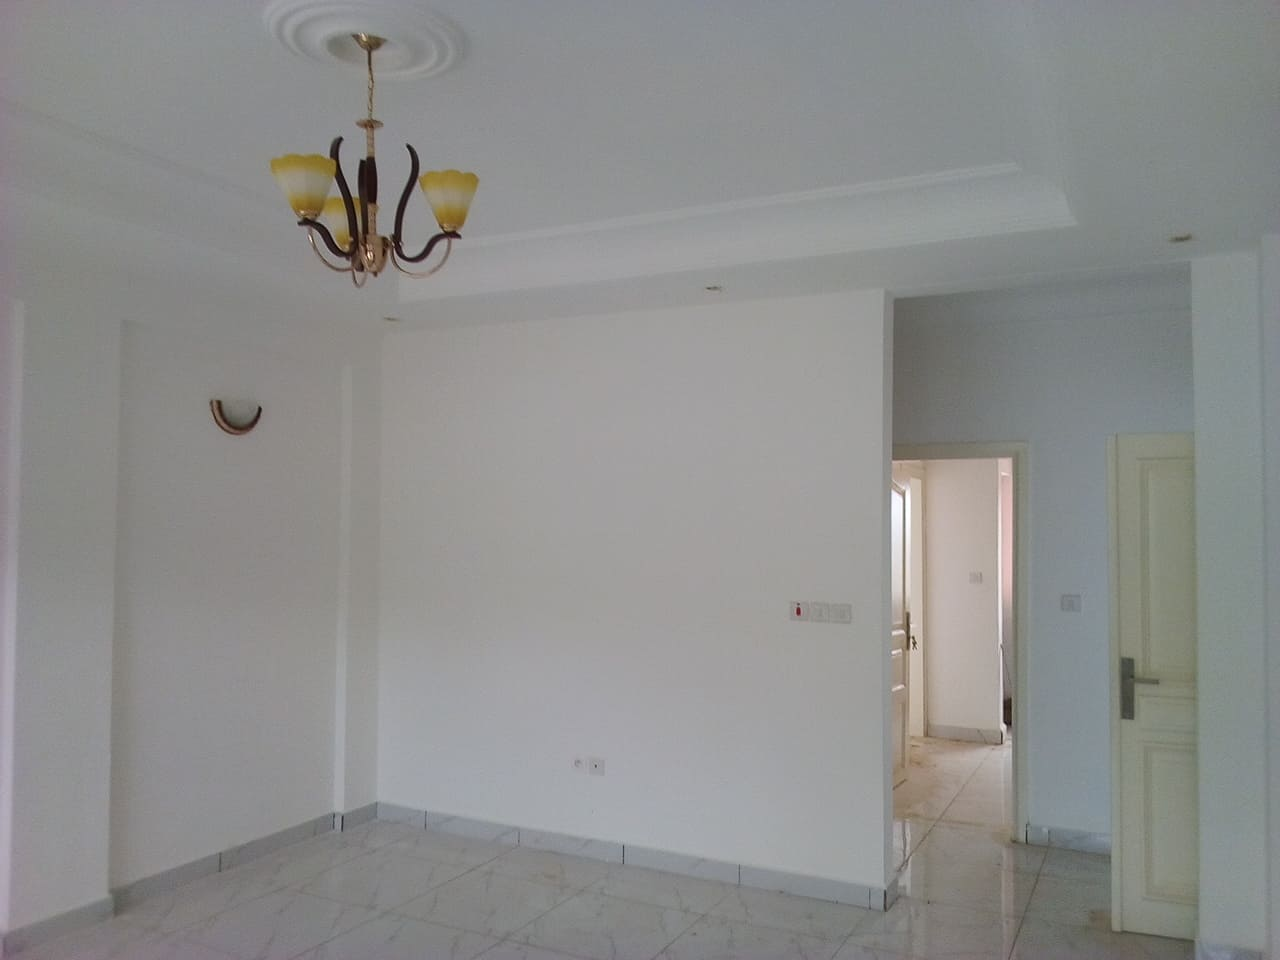 Apartment to rent - Yaoundé, Essos, pas loin de fokou - 1 living room(s), 2 bedroom(s), 3 bathroom(s) - 250 000 FCFA / month